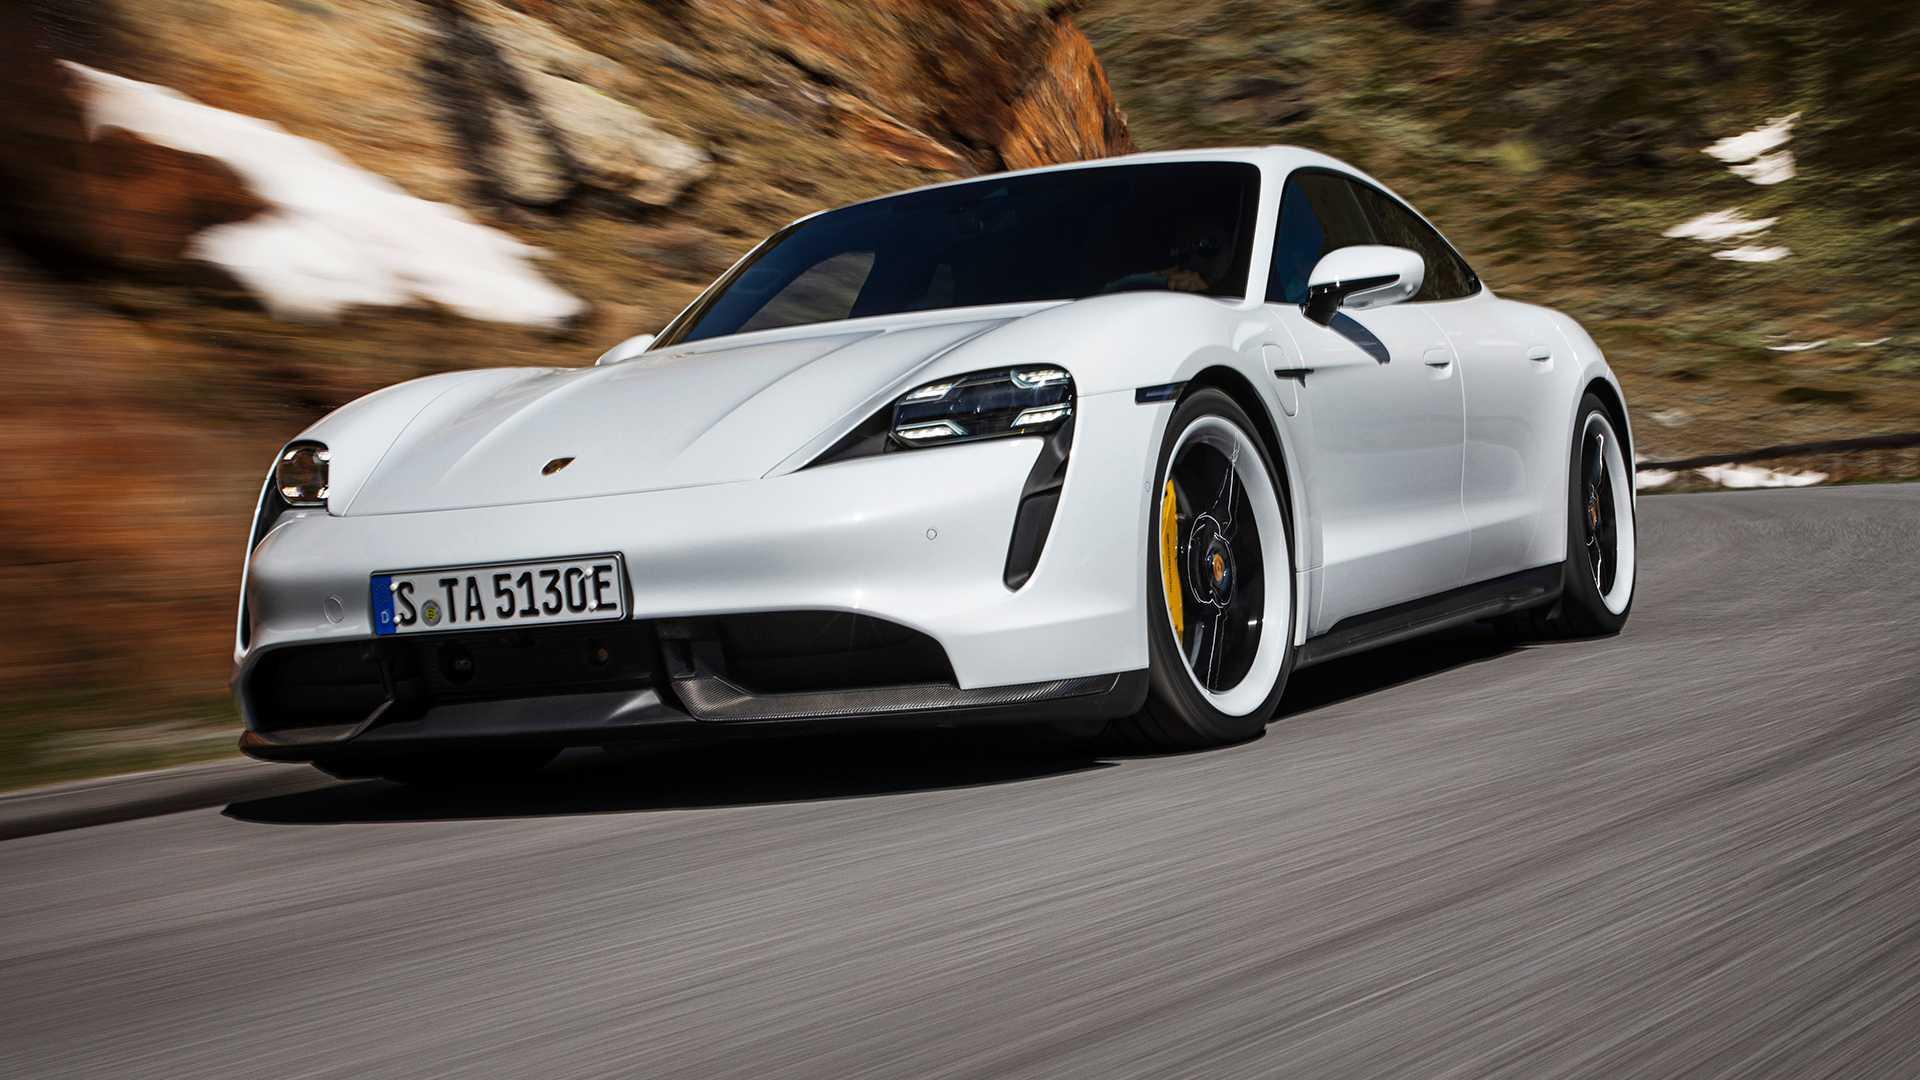 Porsche Taycan News and Reviews Motor1com 1920x1080